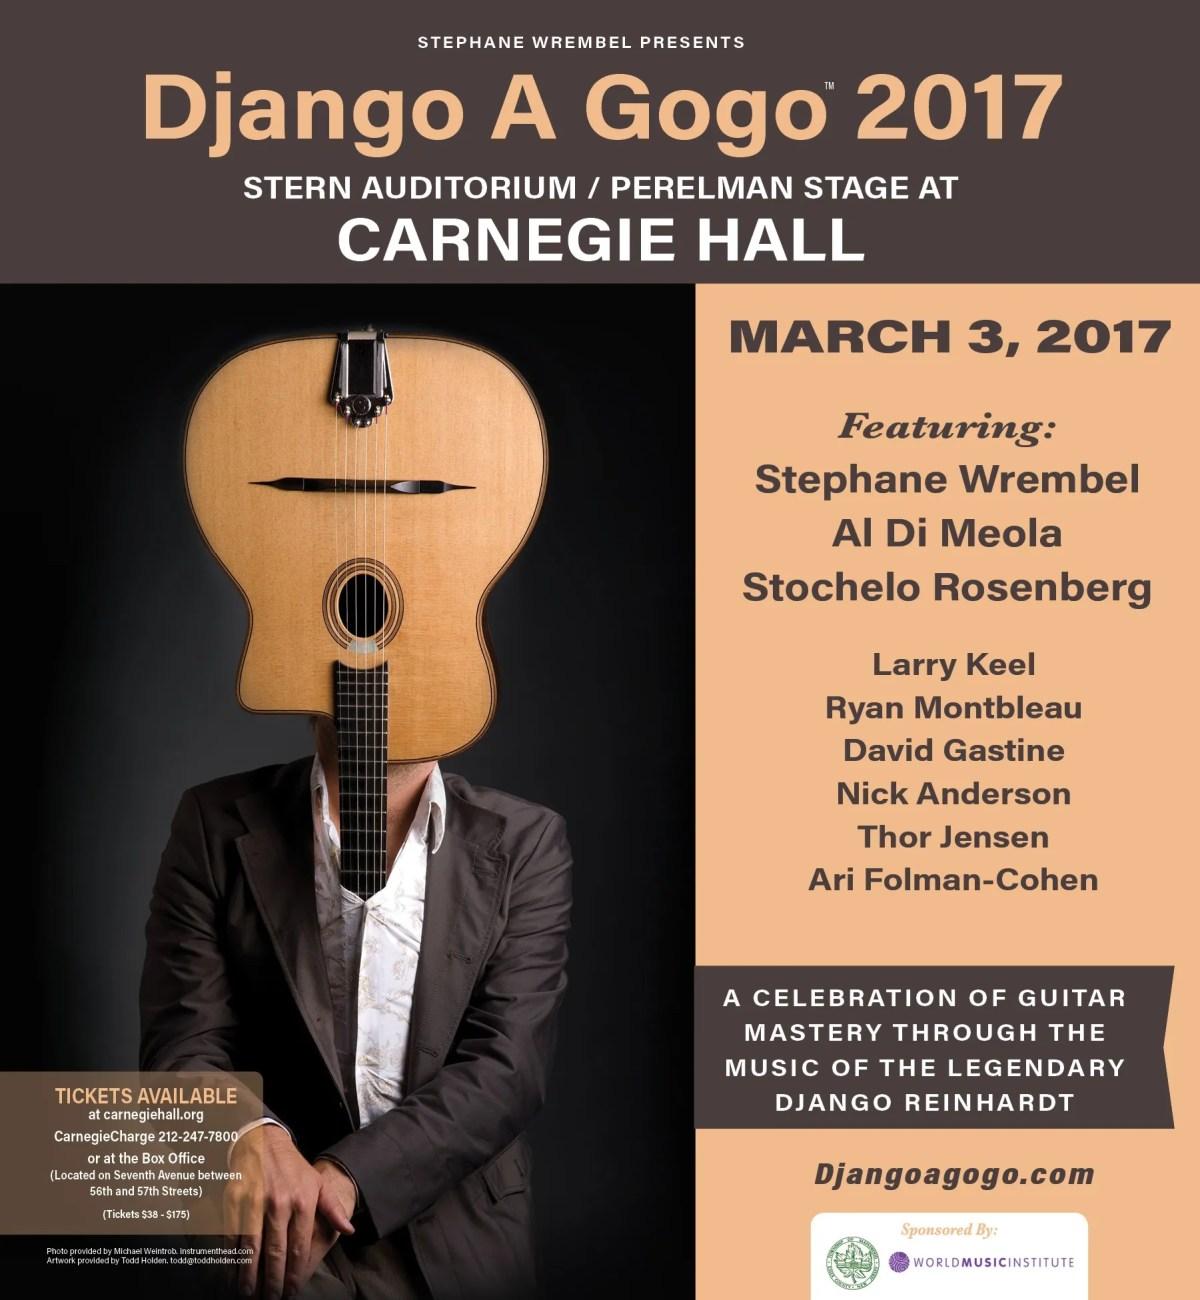 StephaneWrembelPoster 12x13_Concert Only_WEB (2)